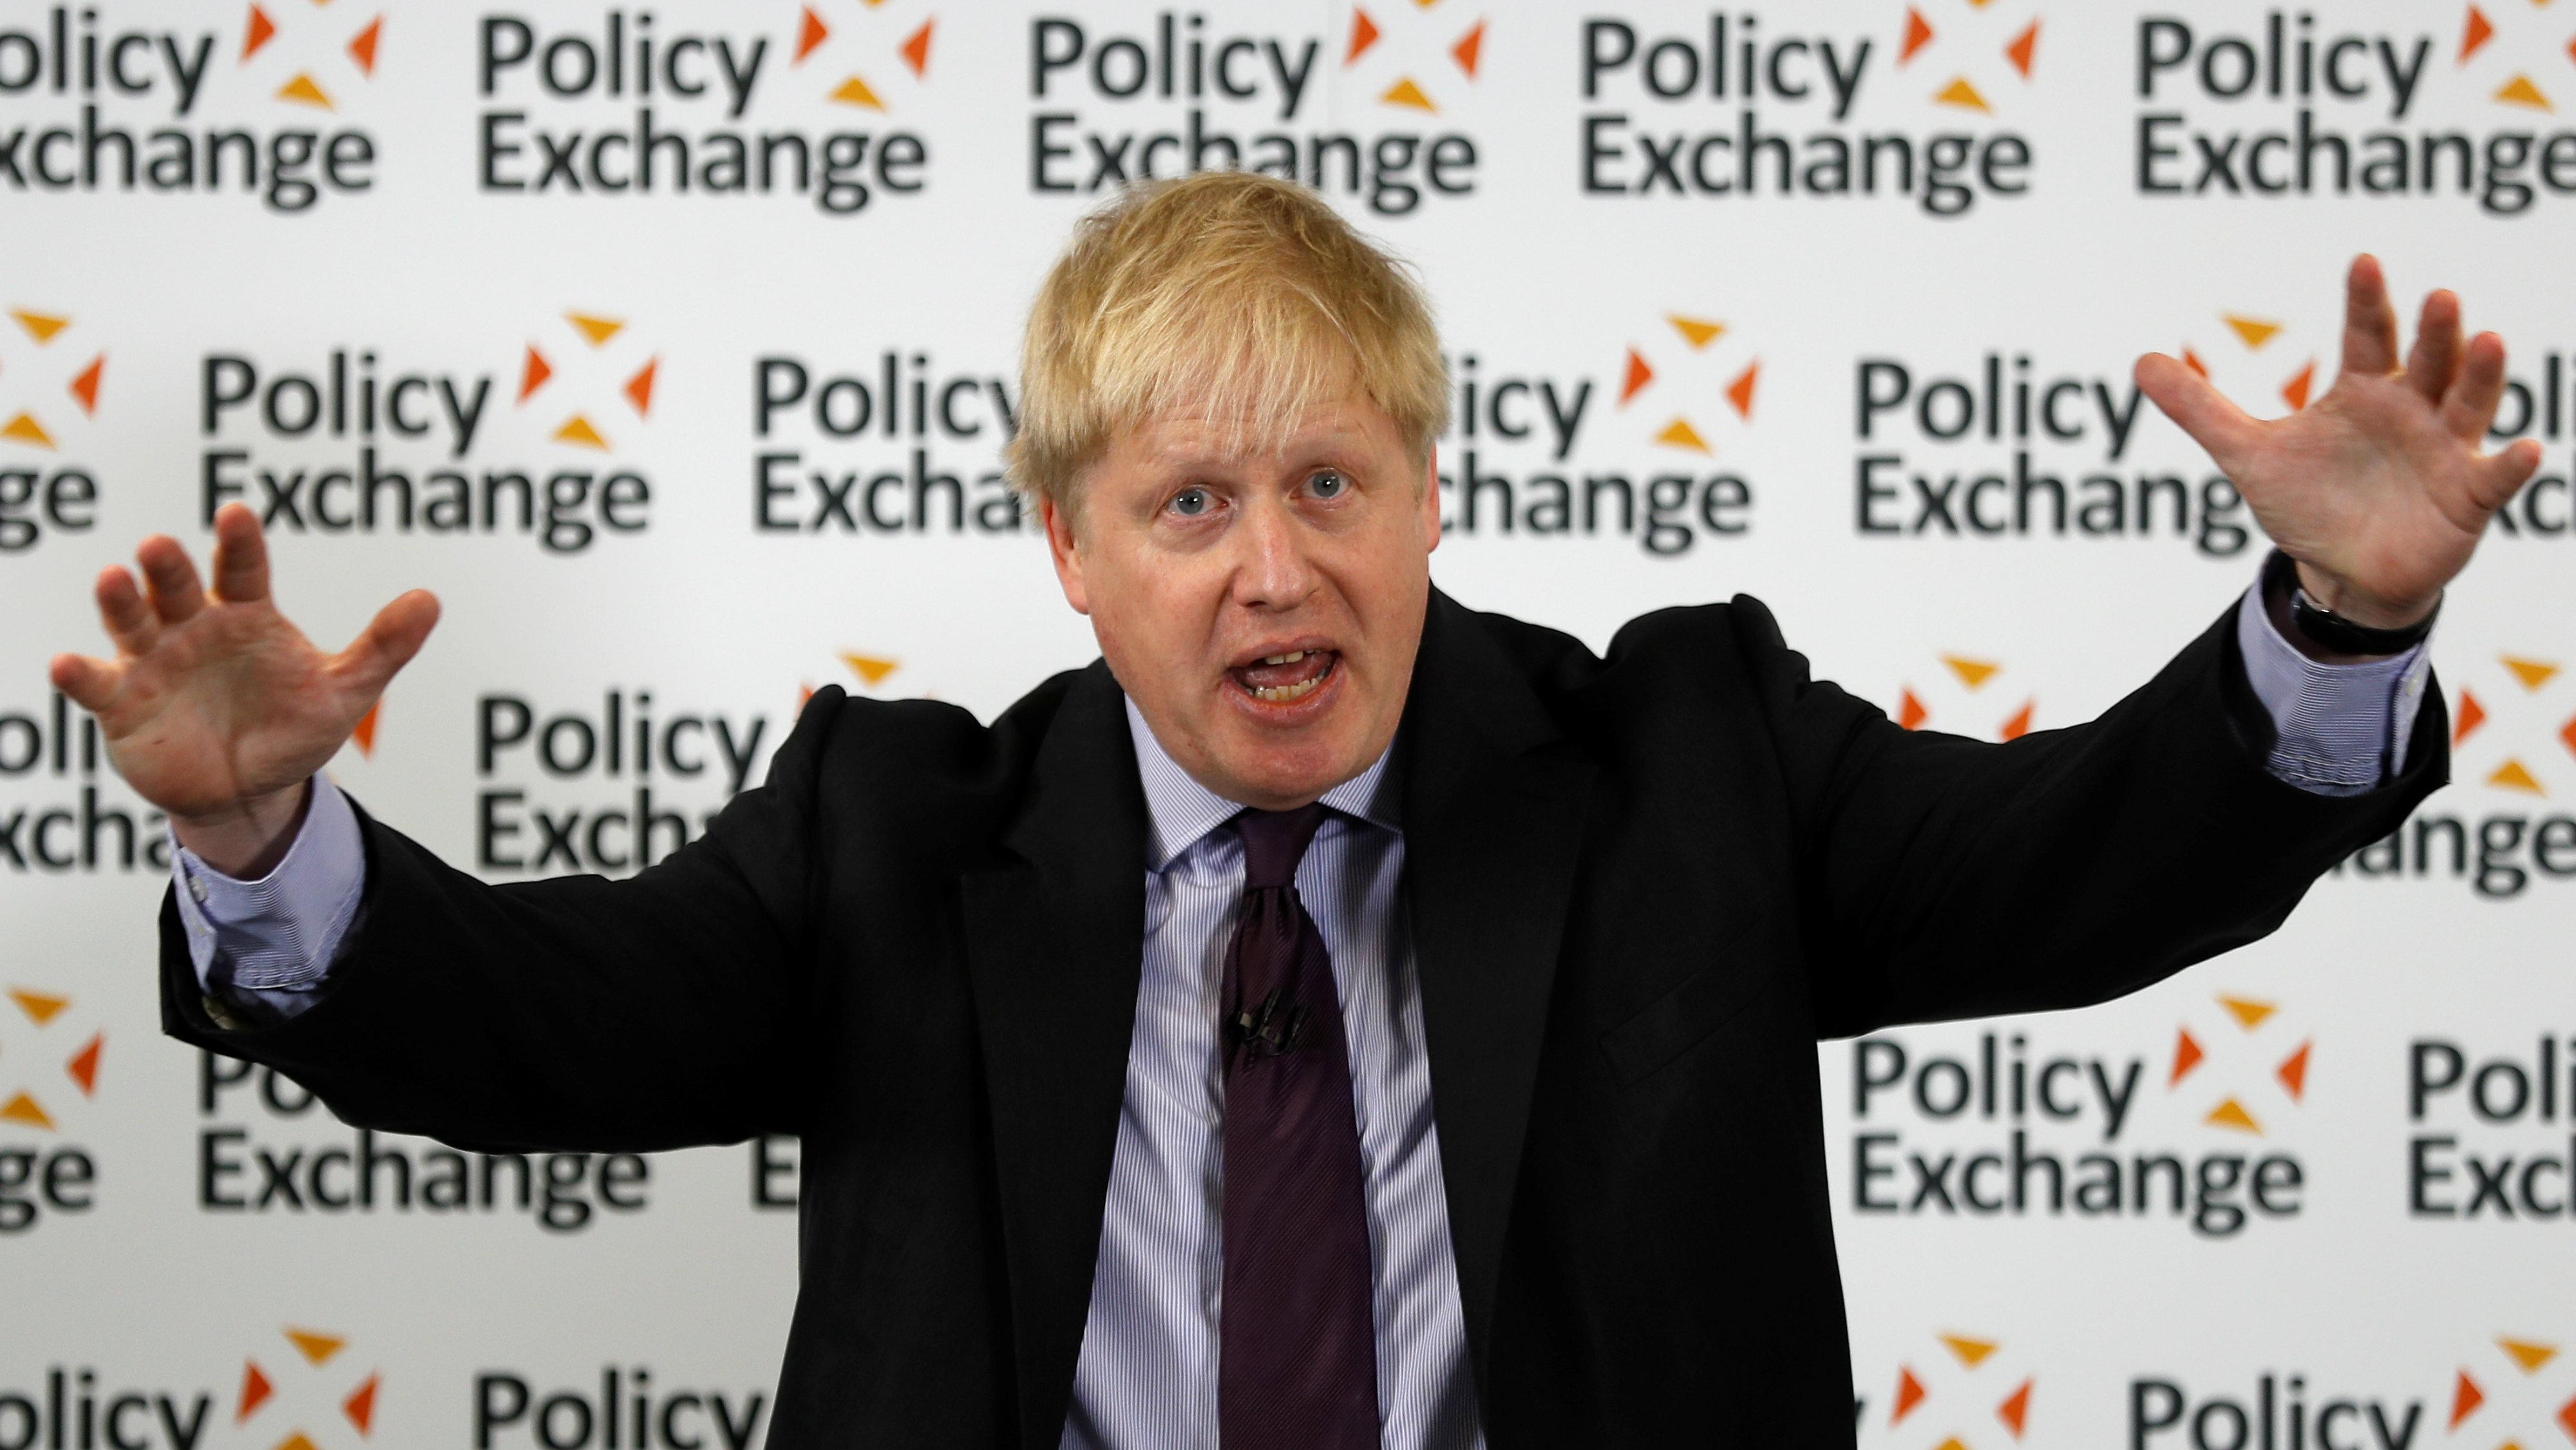 Britain's Foreign Secretary Boris Johnson delivers a speech on Brexit